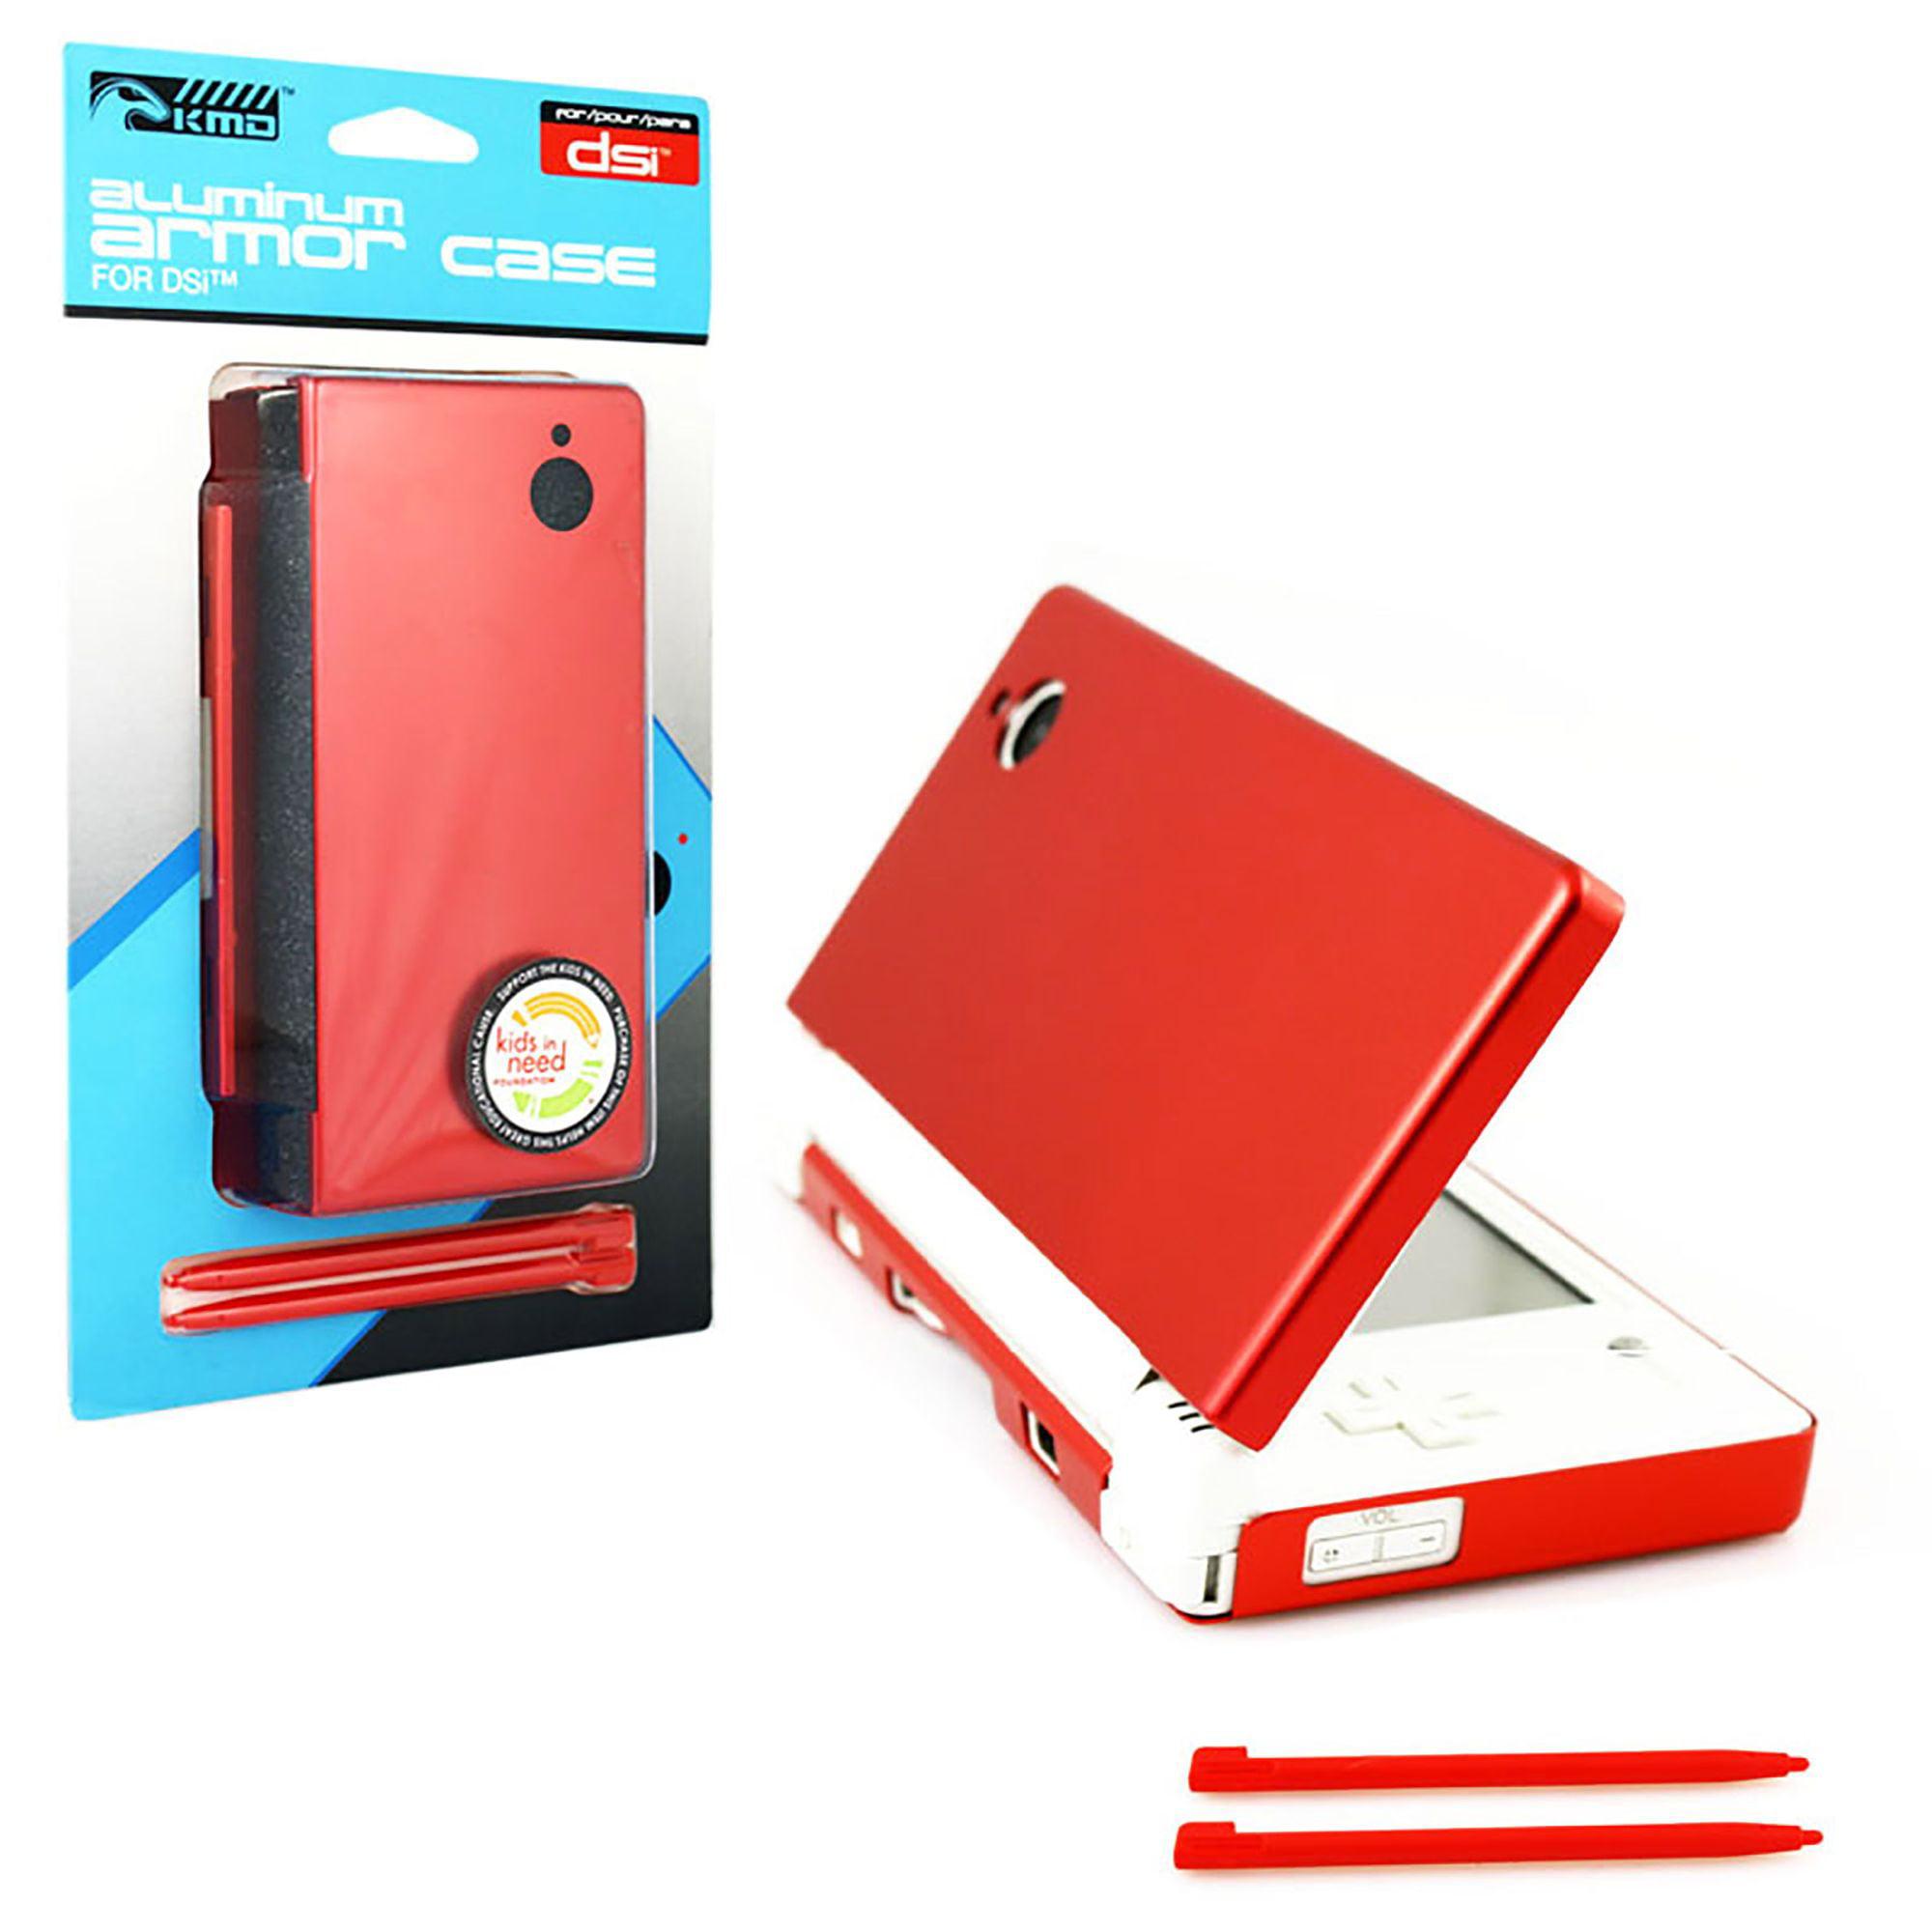 KMD Aluminum Armor Case & Dual Stylus Set For Nintendo DSi, Fire Red